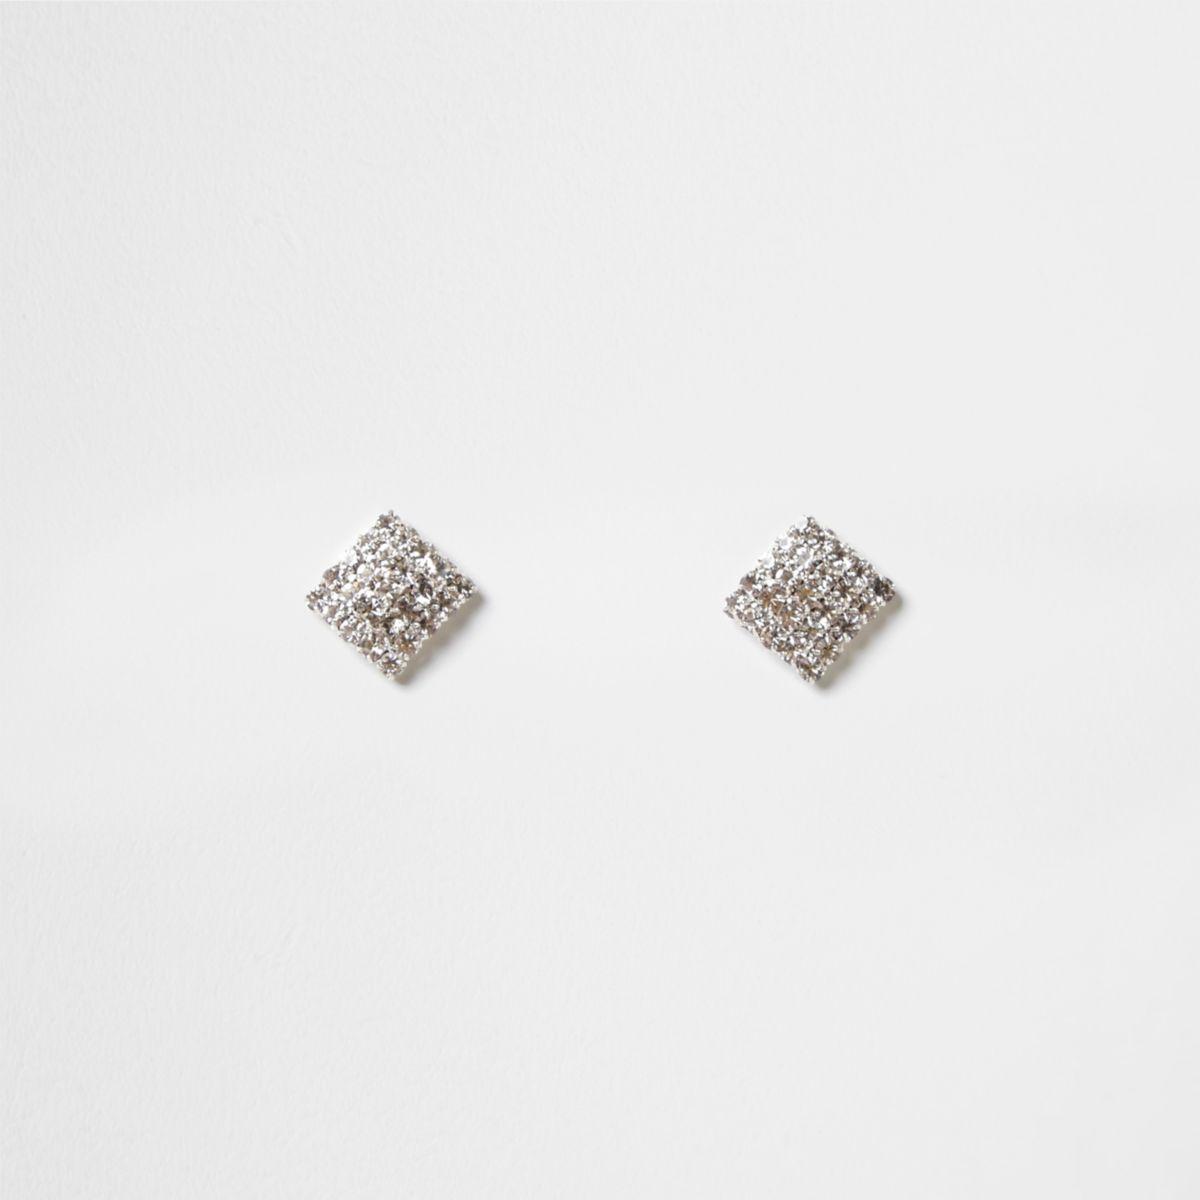 Silver tone diamante square stud earrings